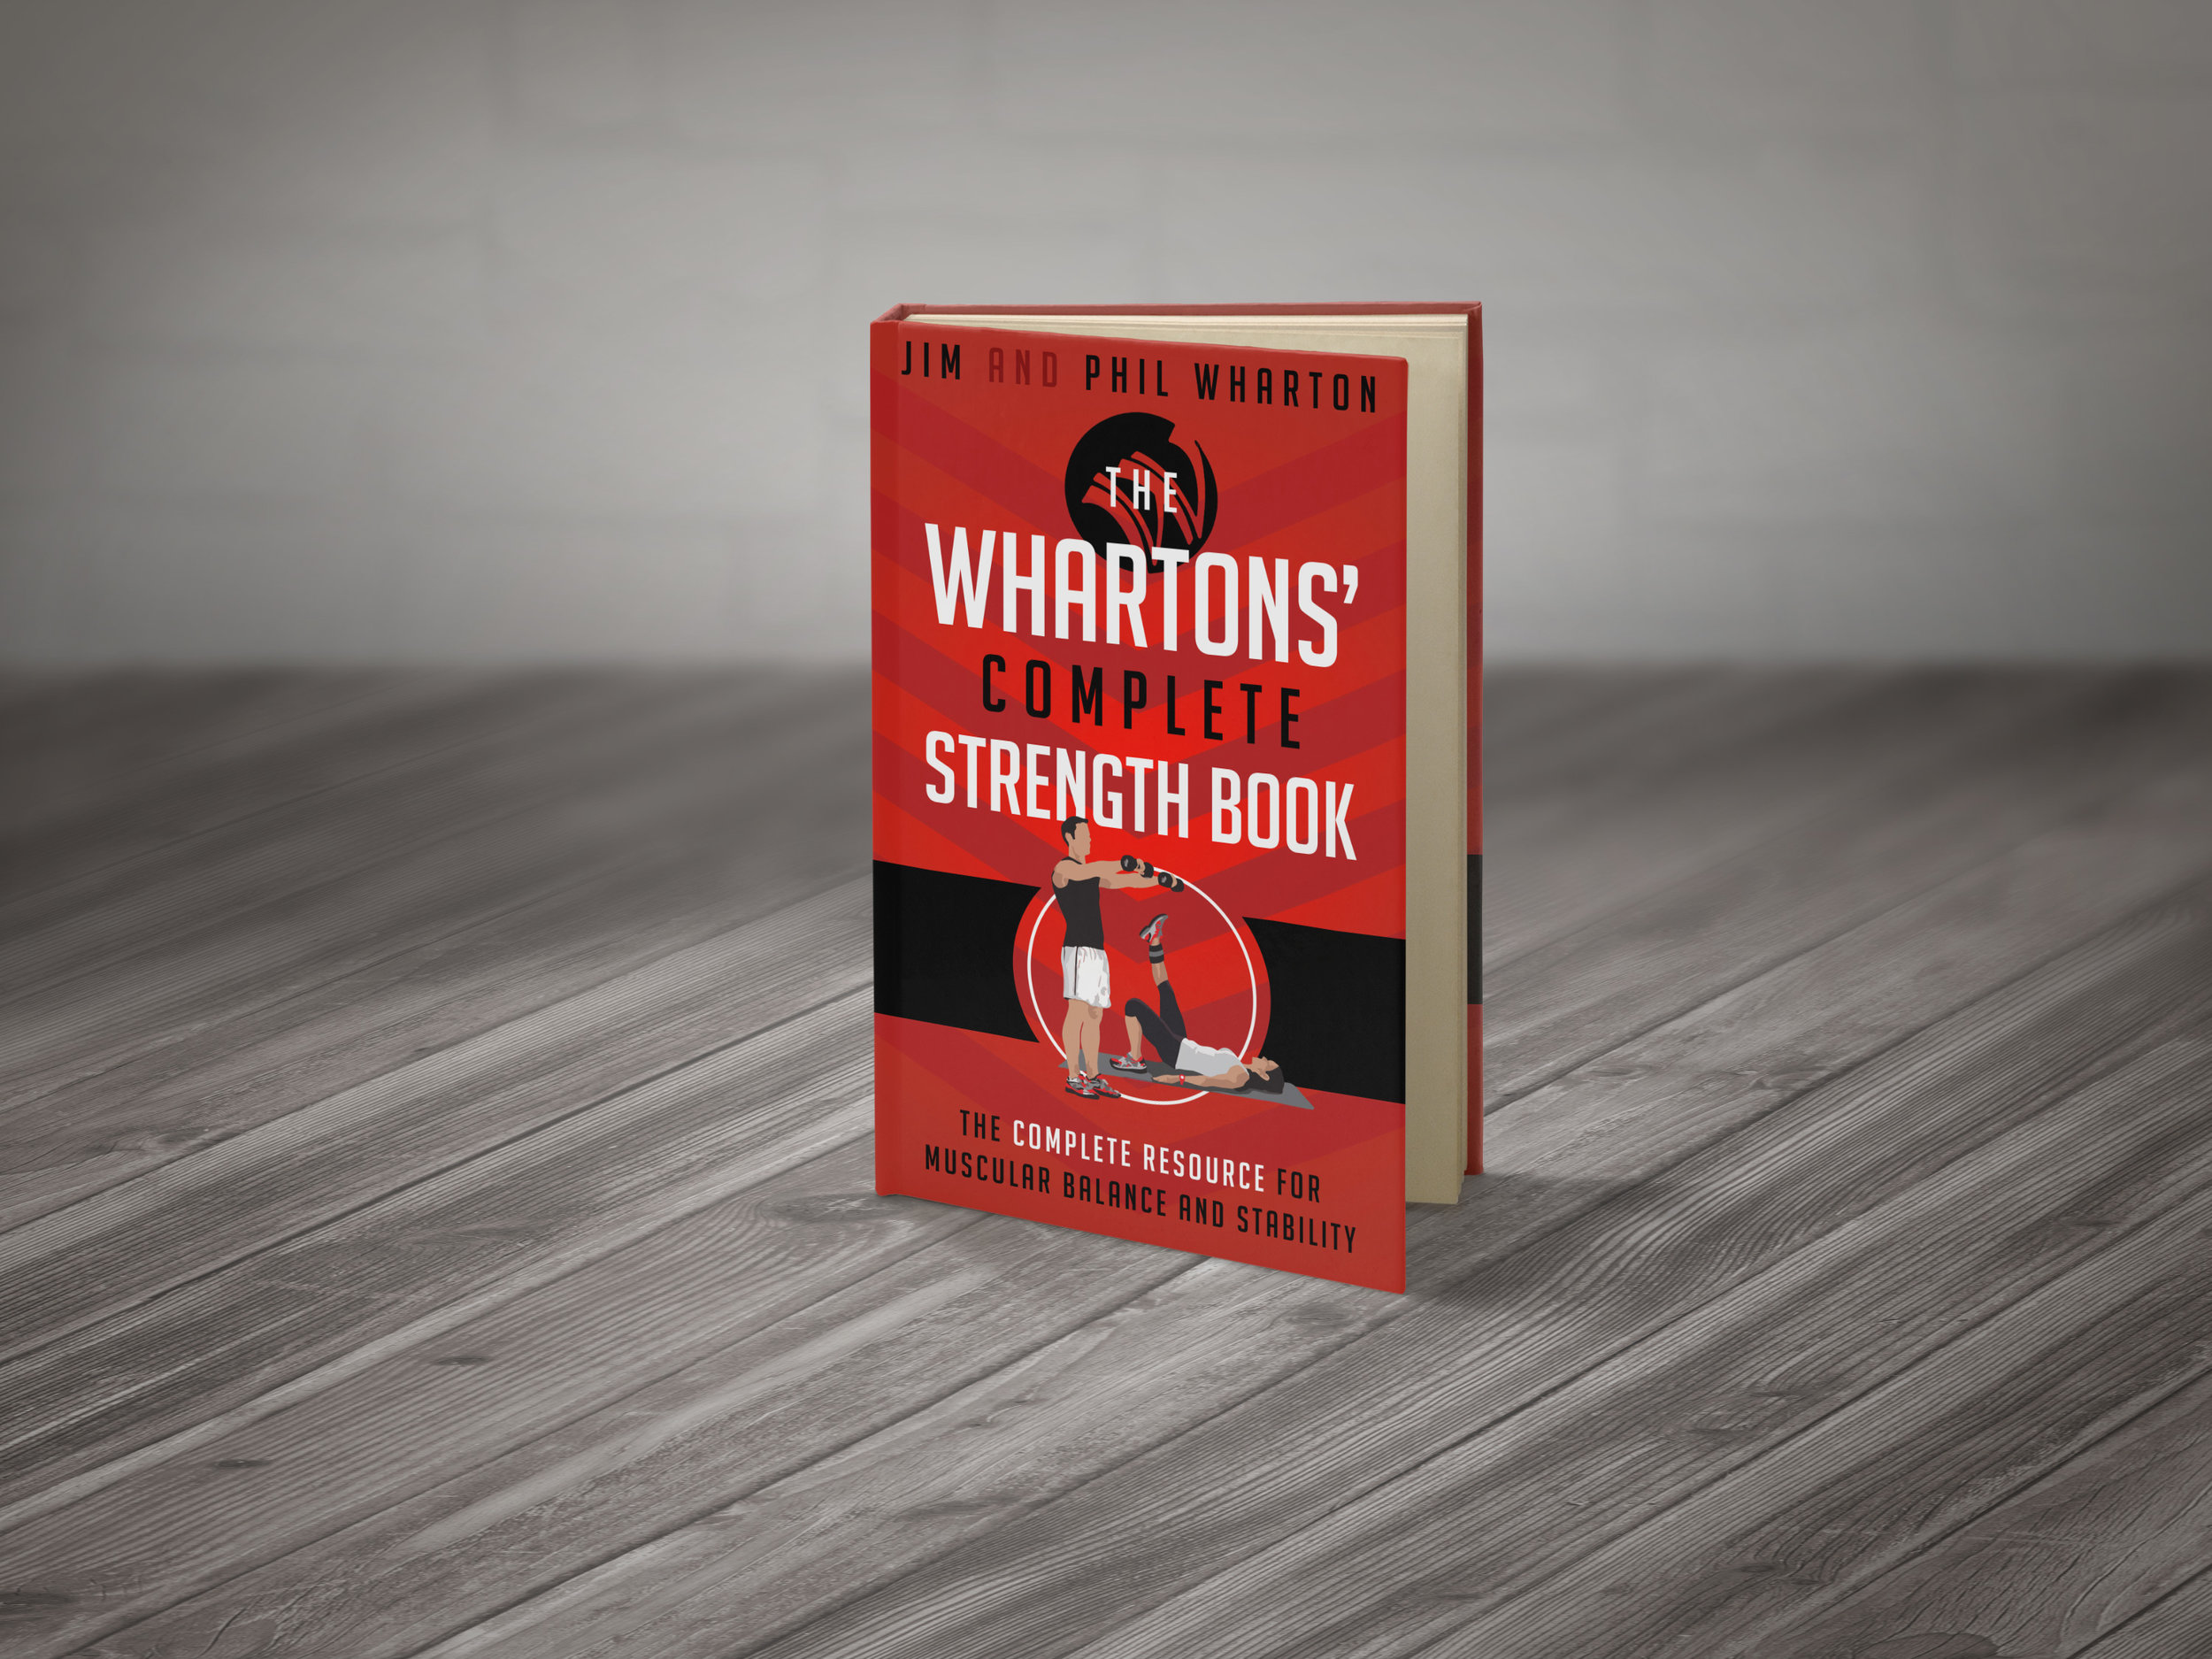 TheWhartonsCompleteStrengthBook_3DMockup_Nov13.jpg